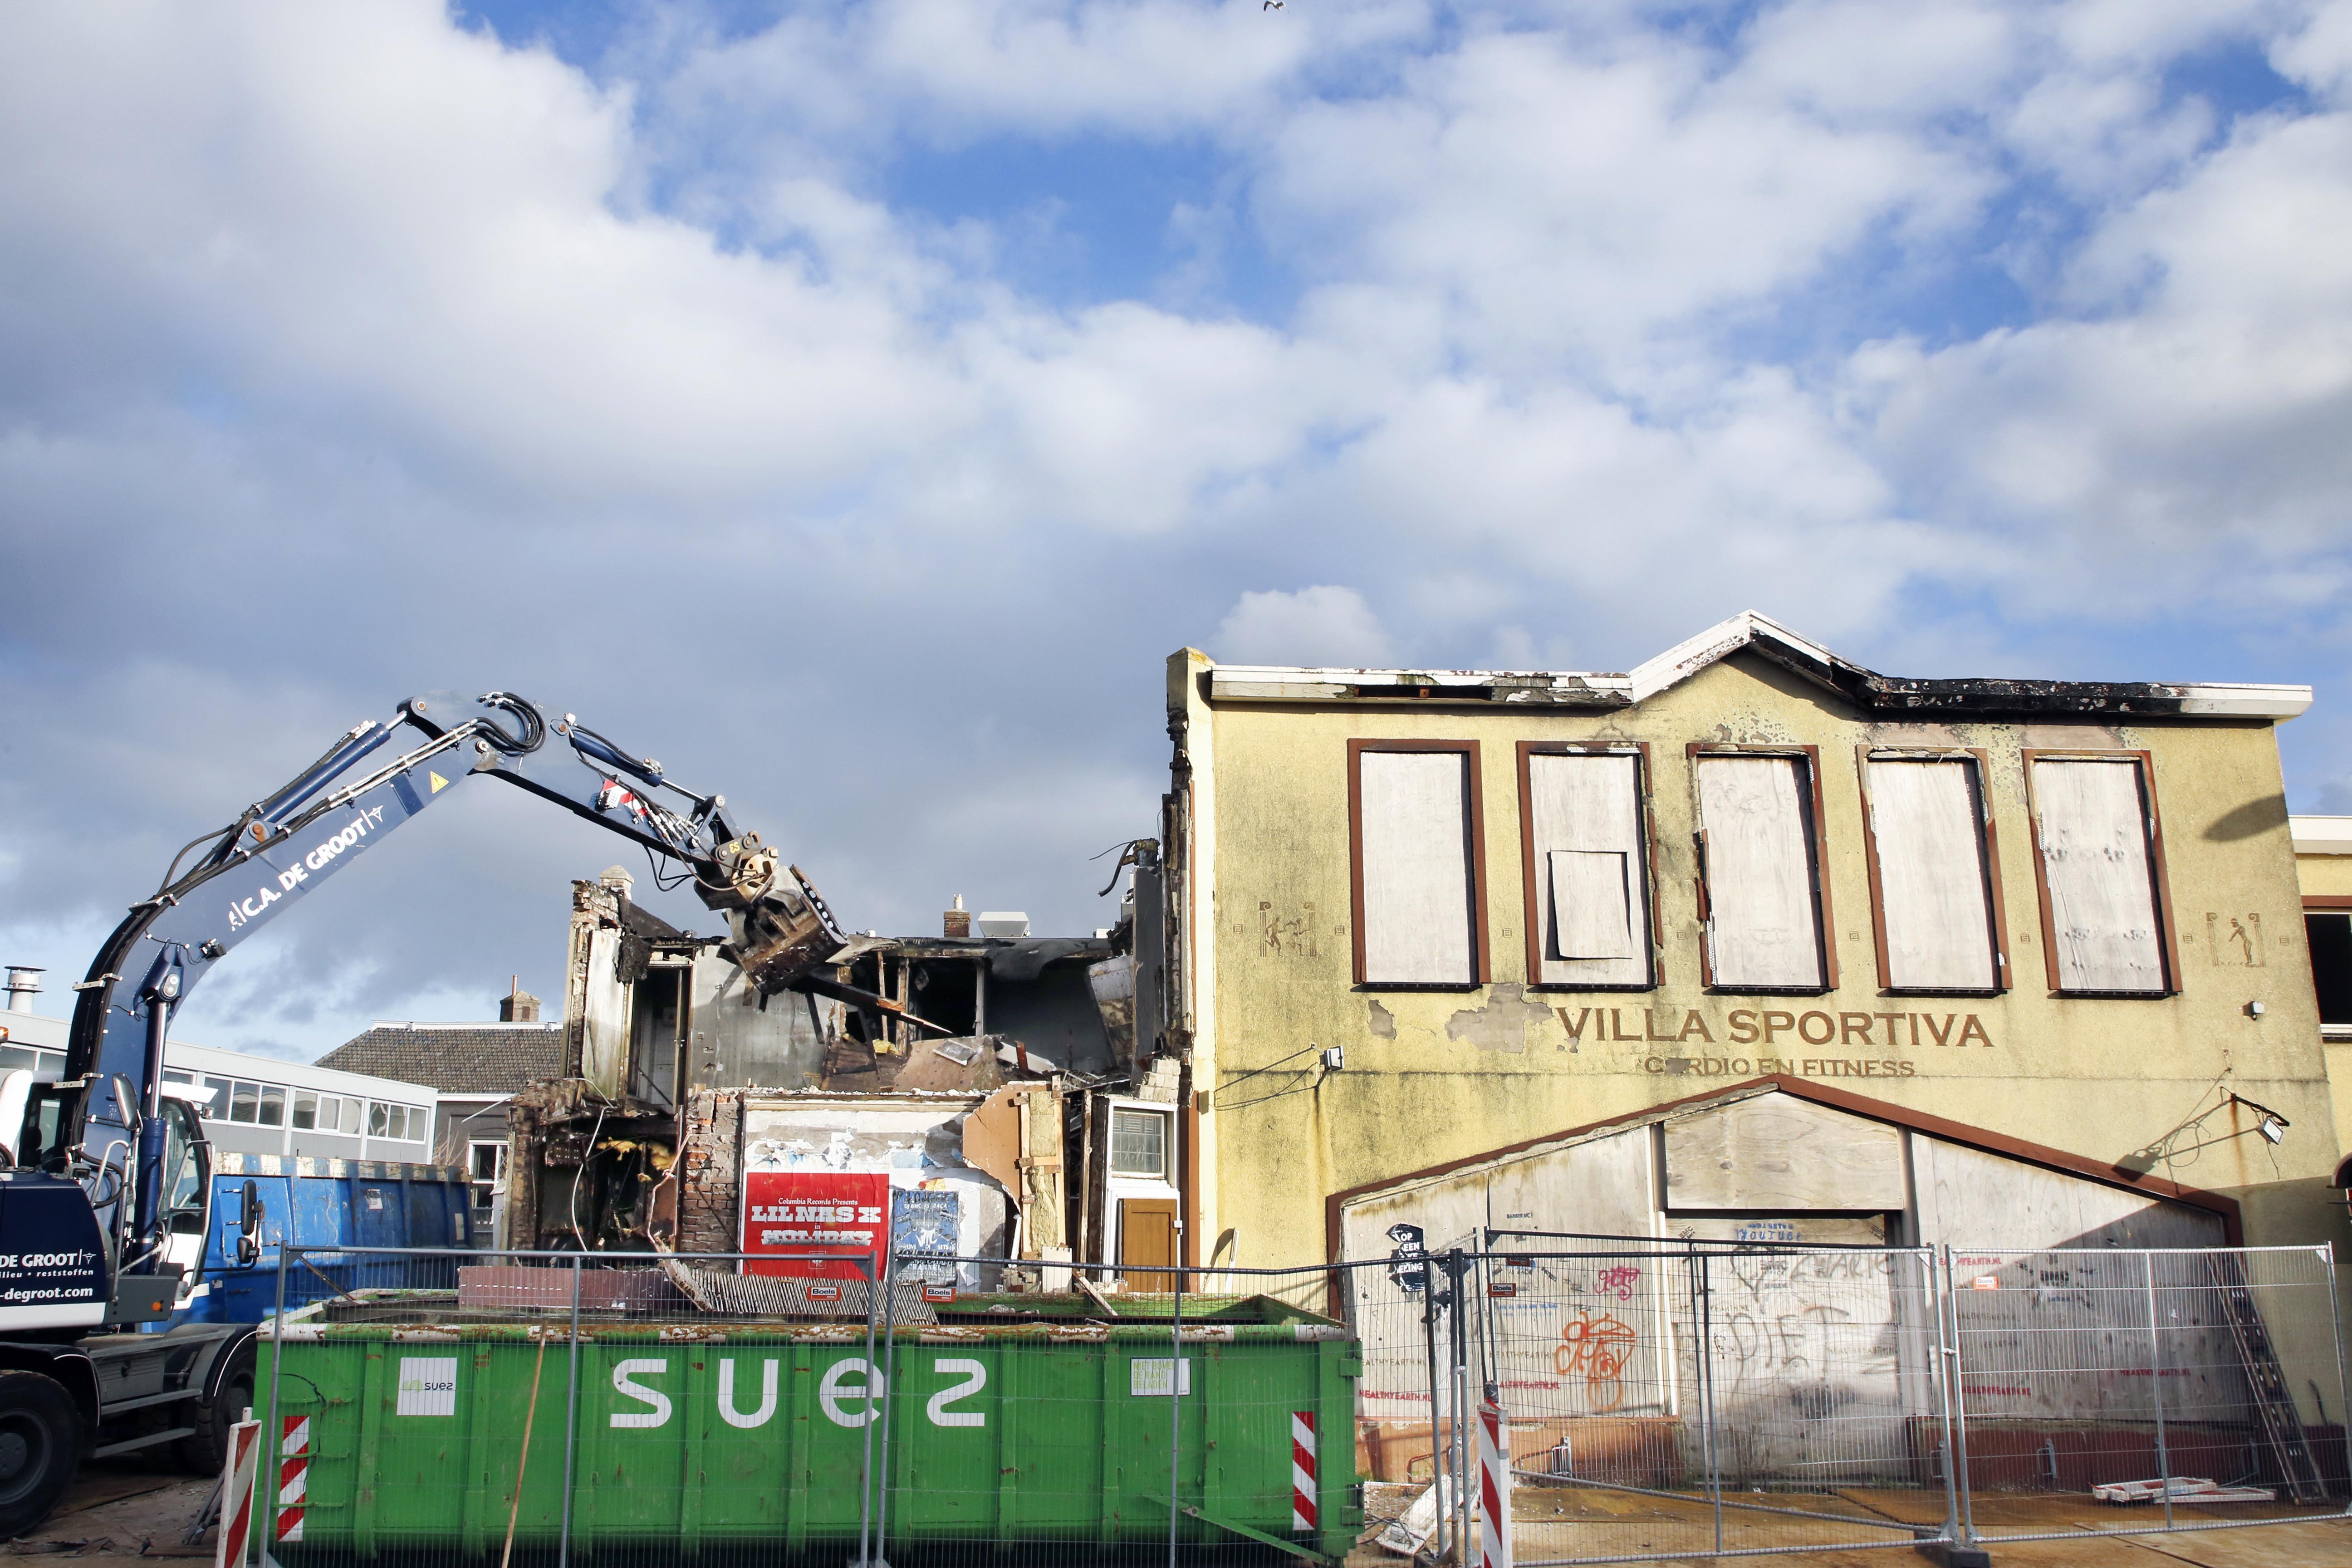 Voormalig Villa Sportiva en grand café La Belle gesloopt voor nog te bouwen hotel